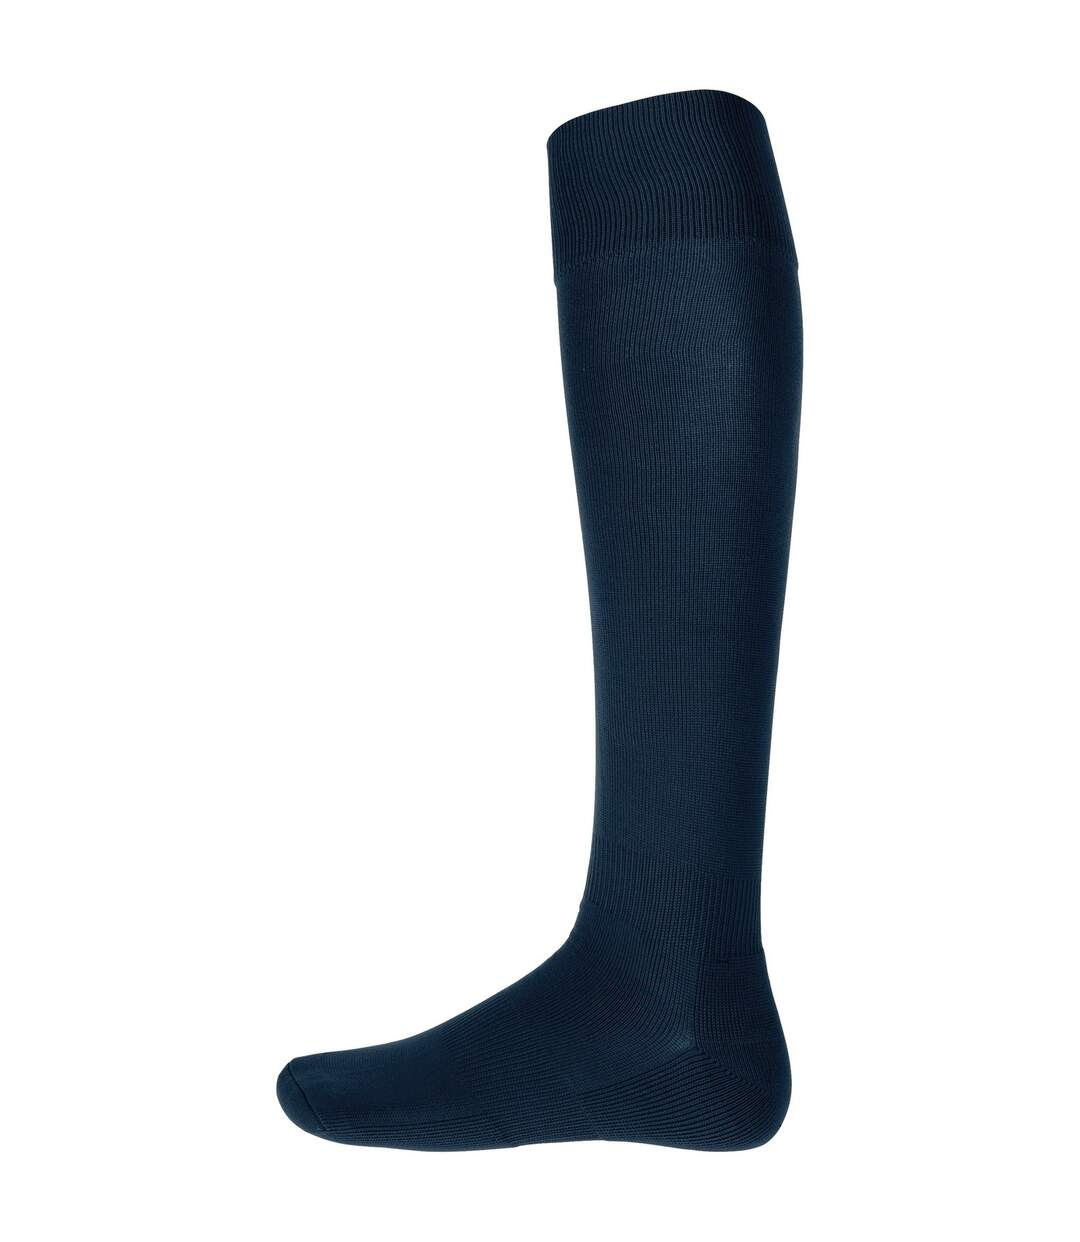 Dégagement Kariban Proact Chaussettes Hautes Sport Homme Bleu marine UTRW4231 dsf.d455nksdKLFHG